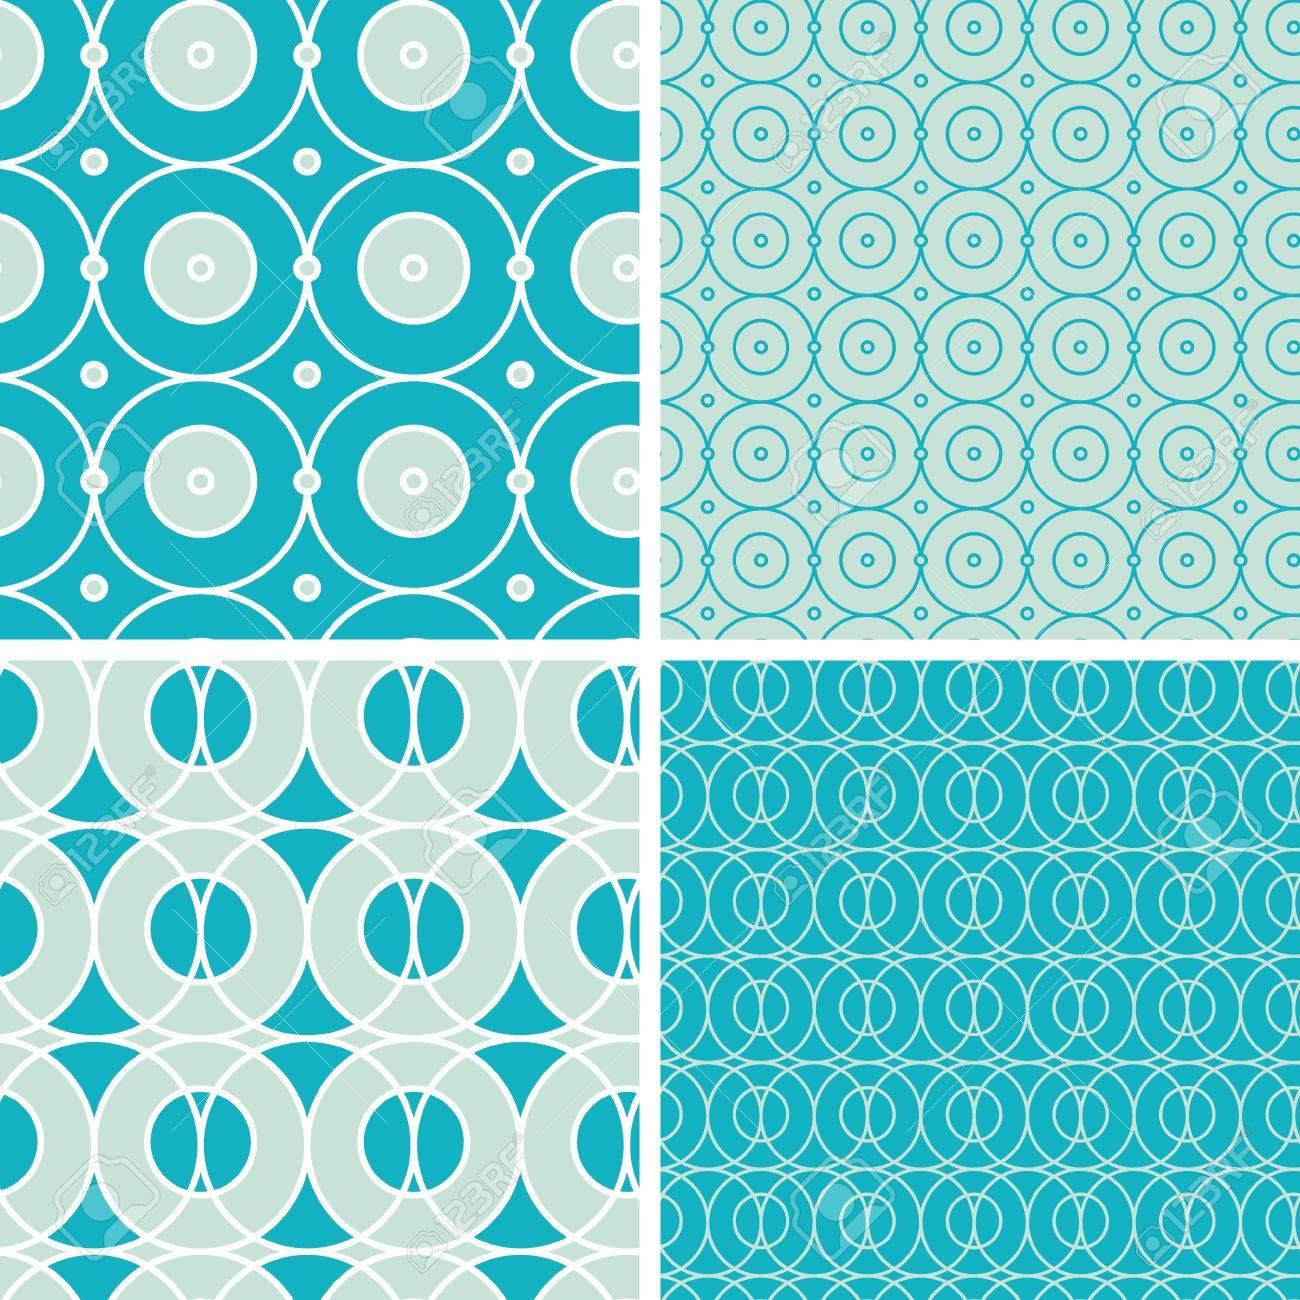 Abstract geometric circles seamless patterns set - 20610131